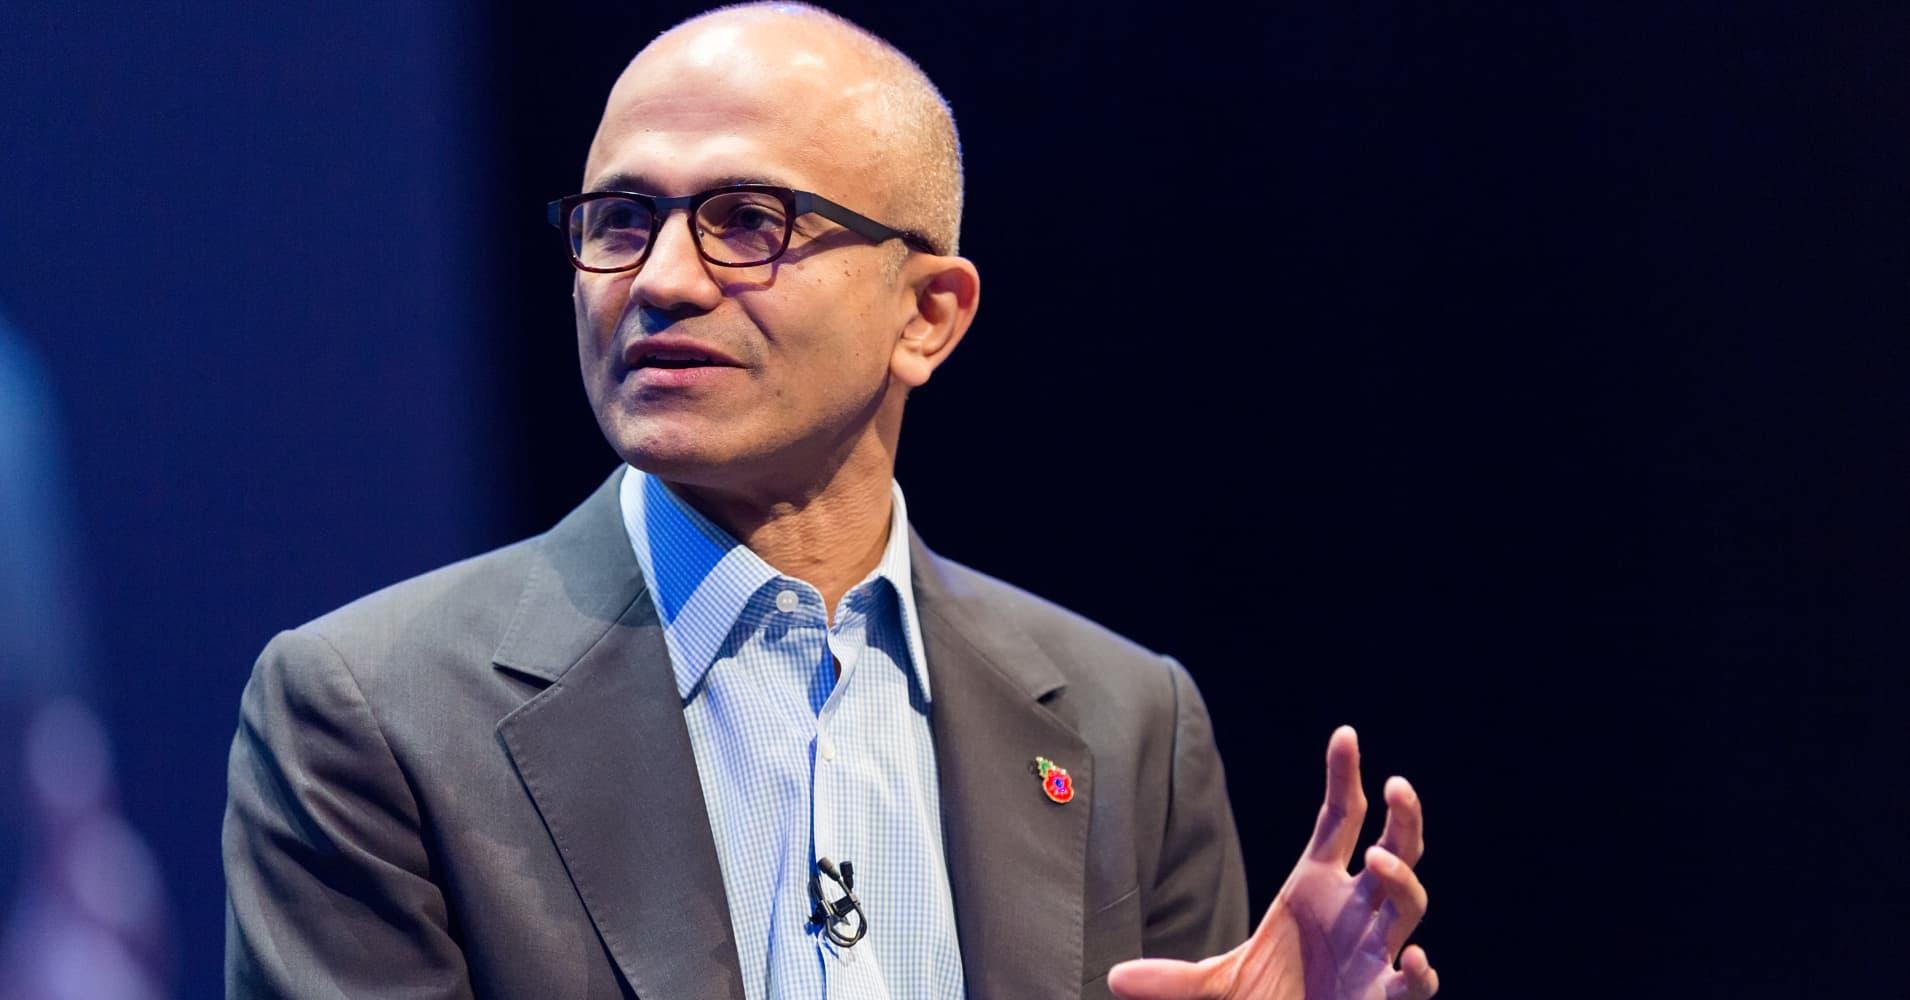 Microsoft CEO Satya Nadella at a company conference in 2014.